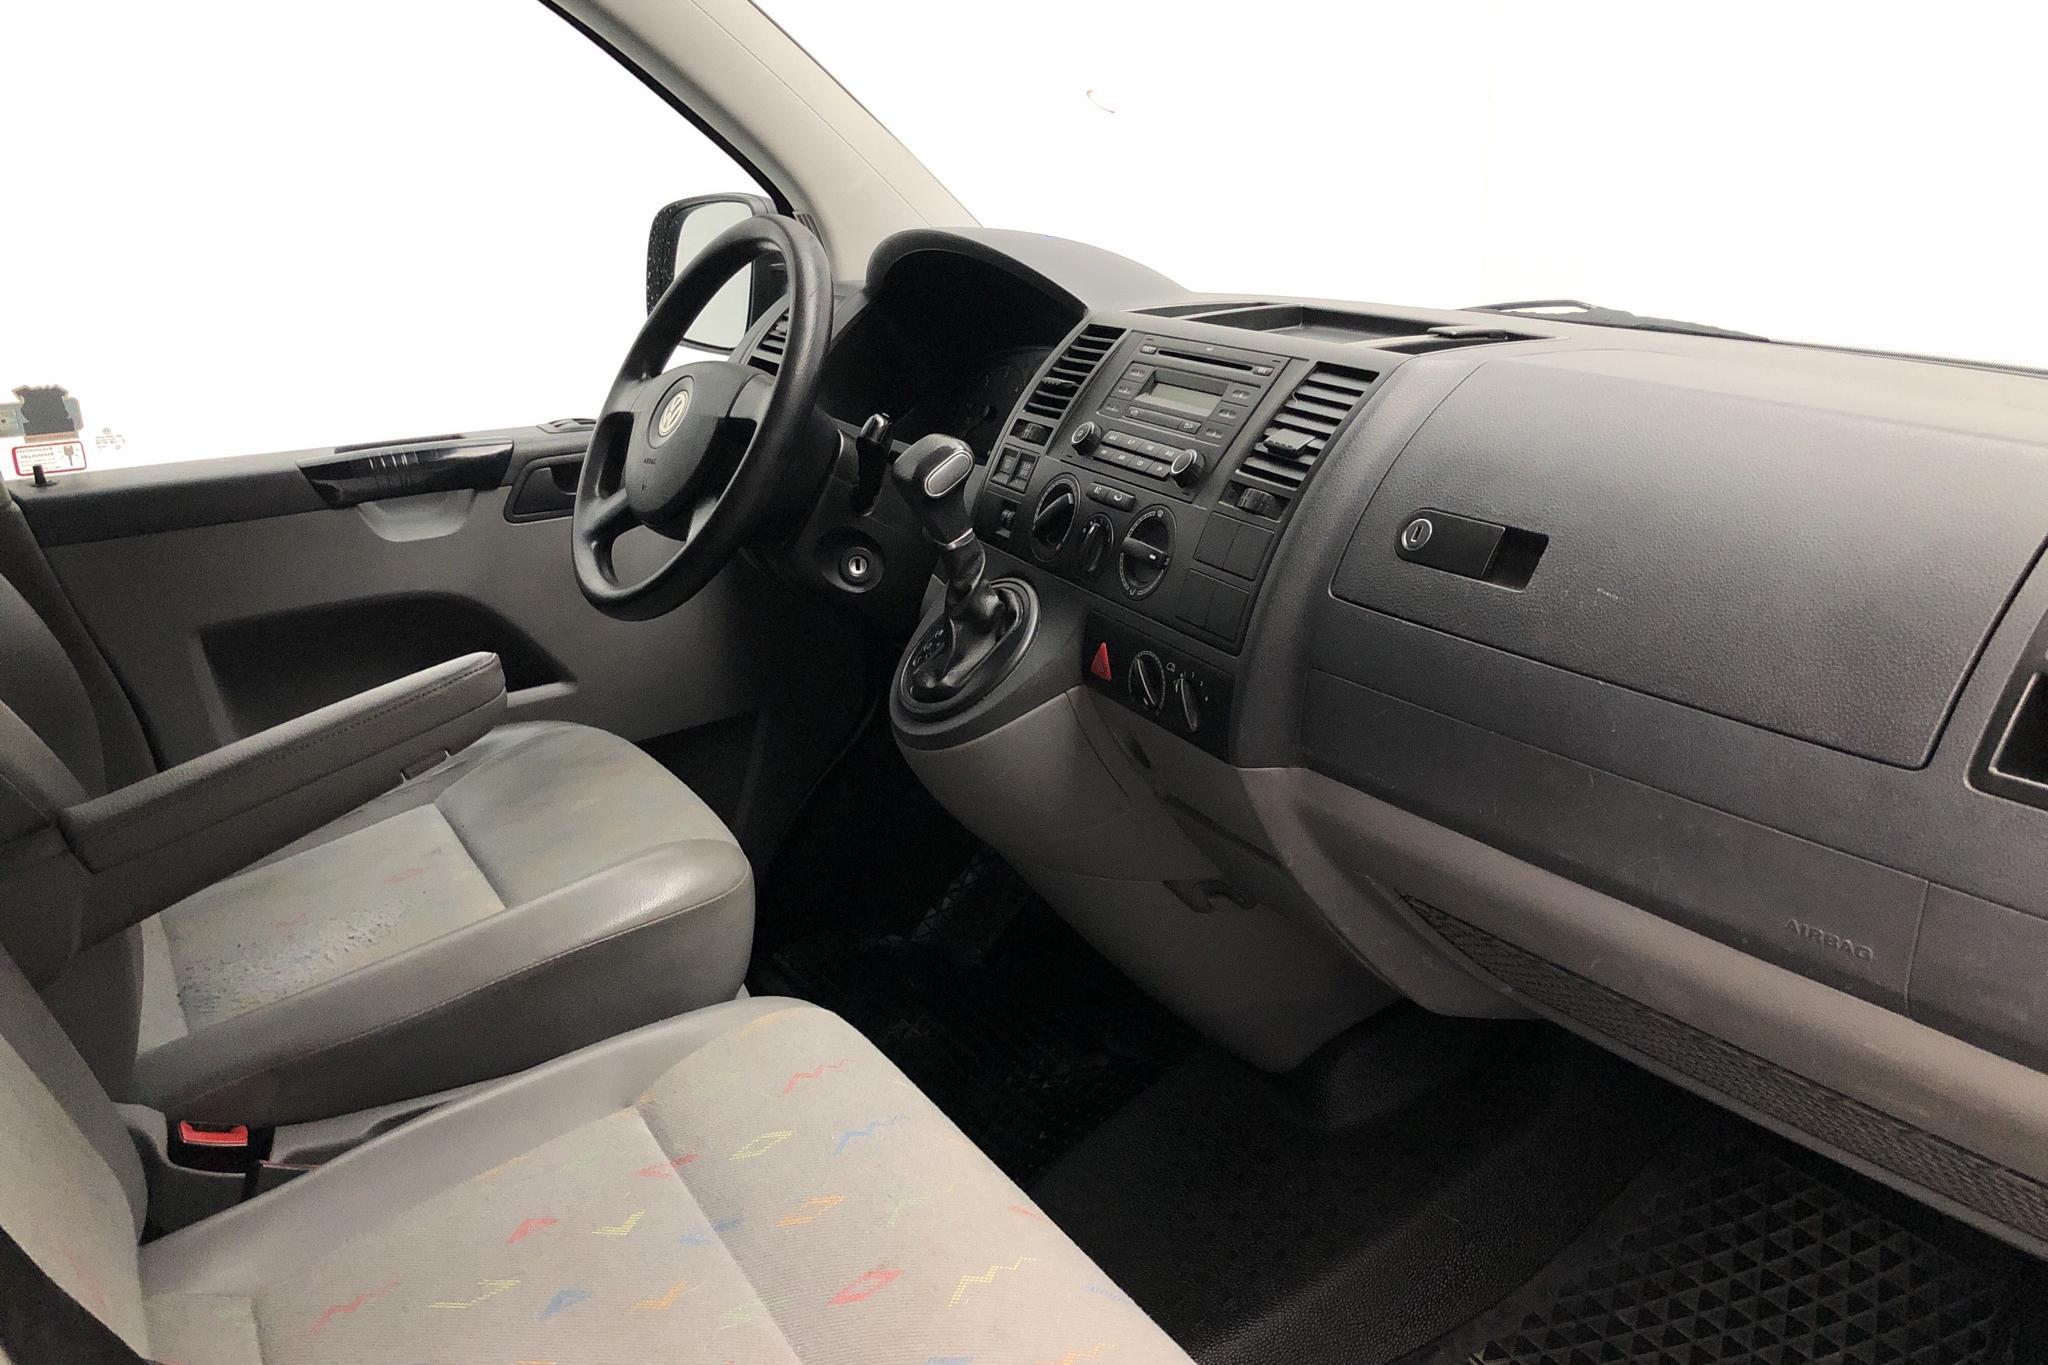 VW Transporter T5 2.5 TDI (130hk) - 150 870 km - Automatic - white - 2008